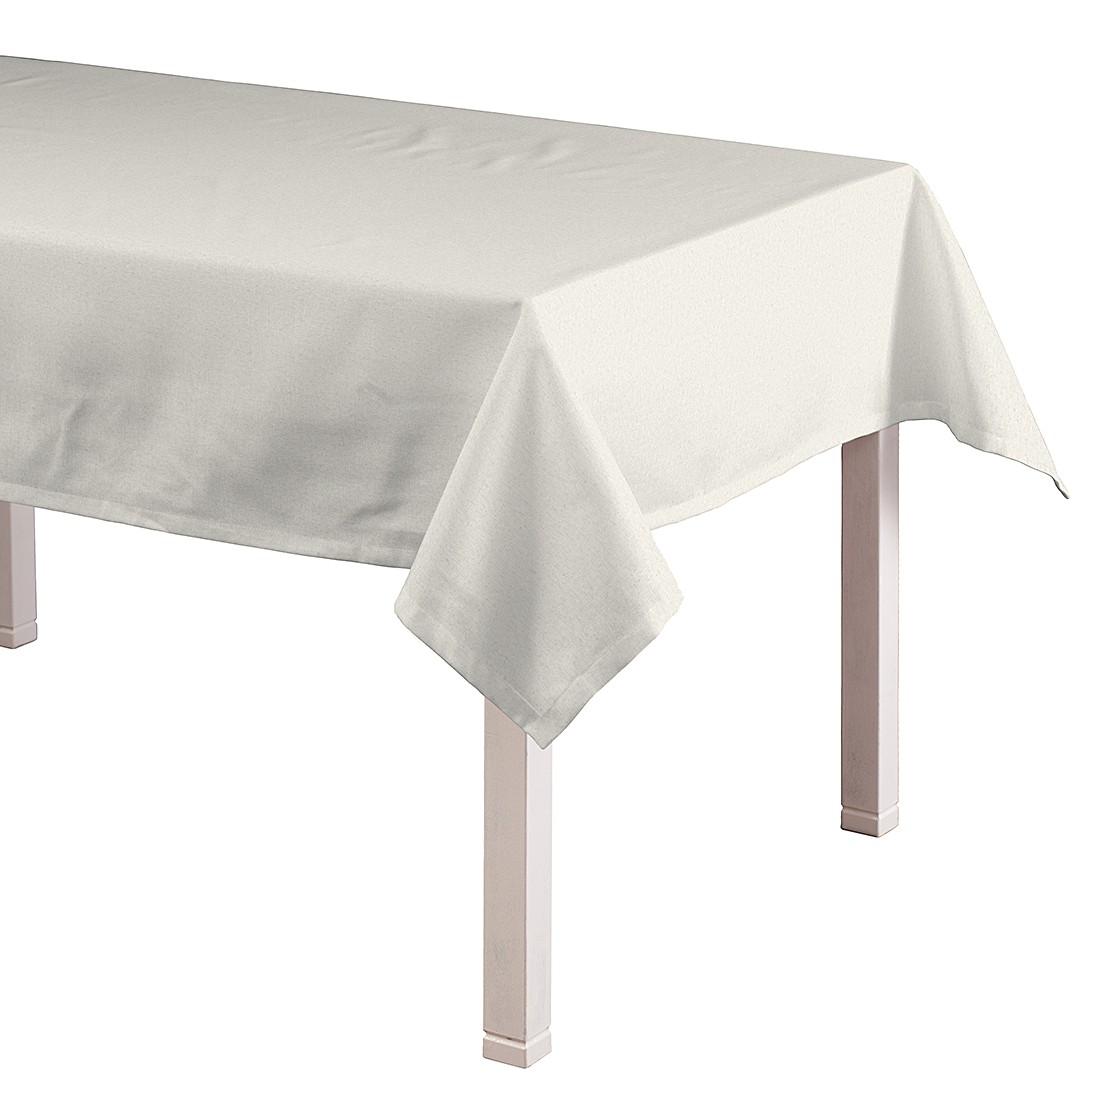 Tischdecke Loneta – Creme – 130 x 130 cm, Dekoria jetzt bestellen